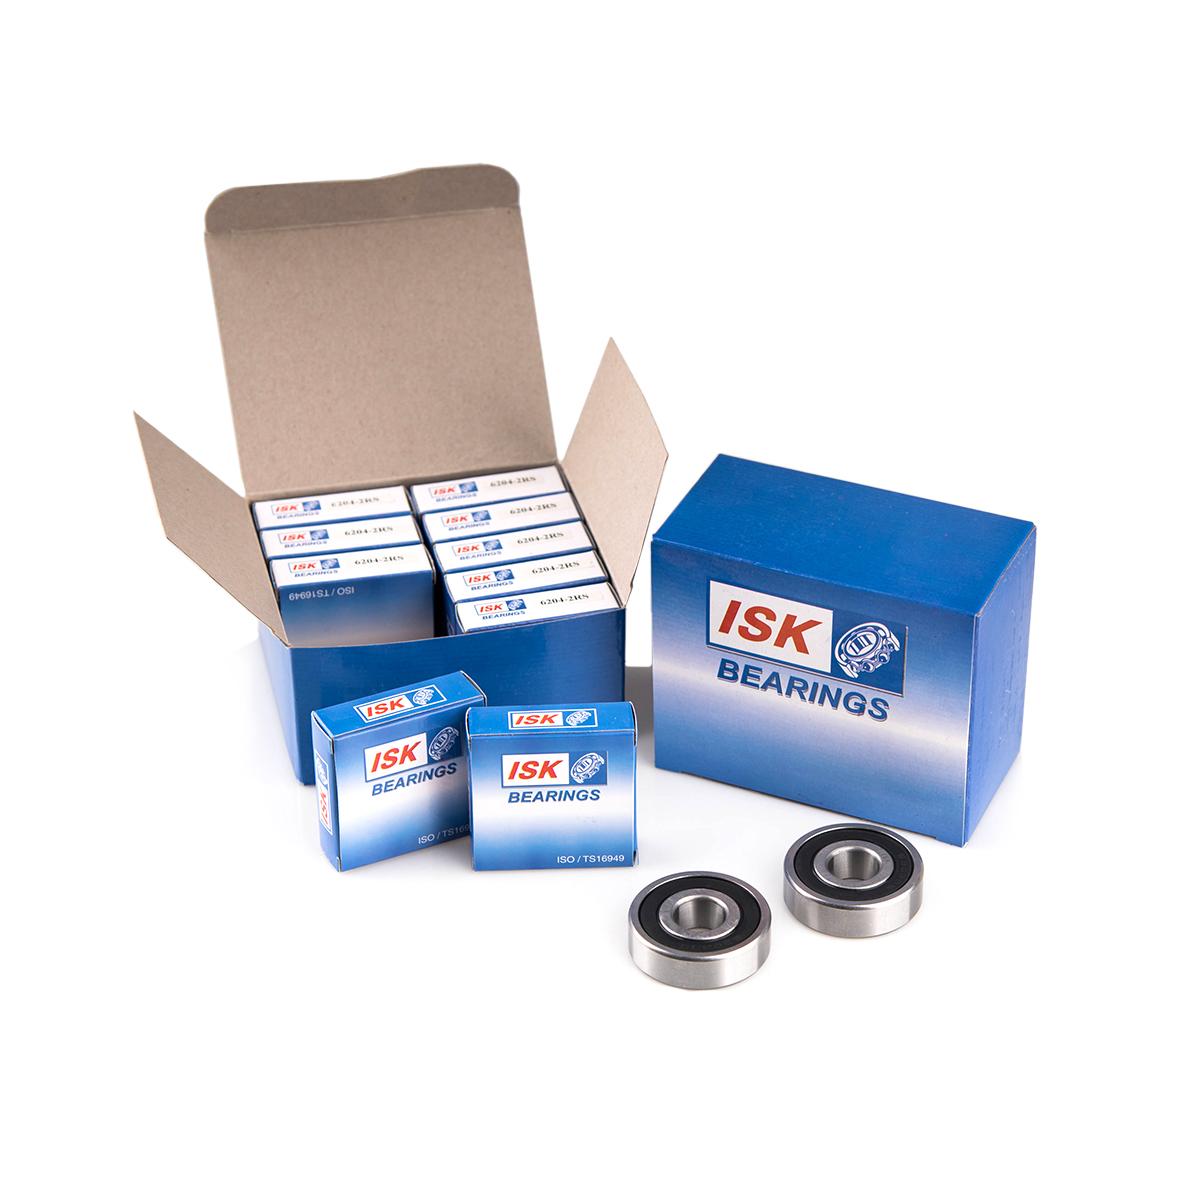 Ball Bearing 6200 6201 6202 6203 6204 6205 ZZ 2RS for Motor Bearing Ceiling Fan Bearing